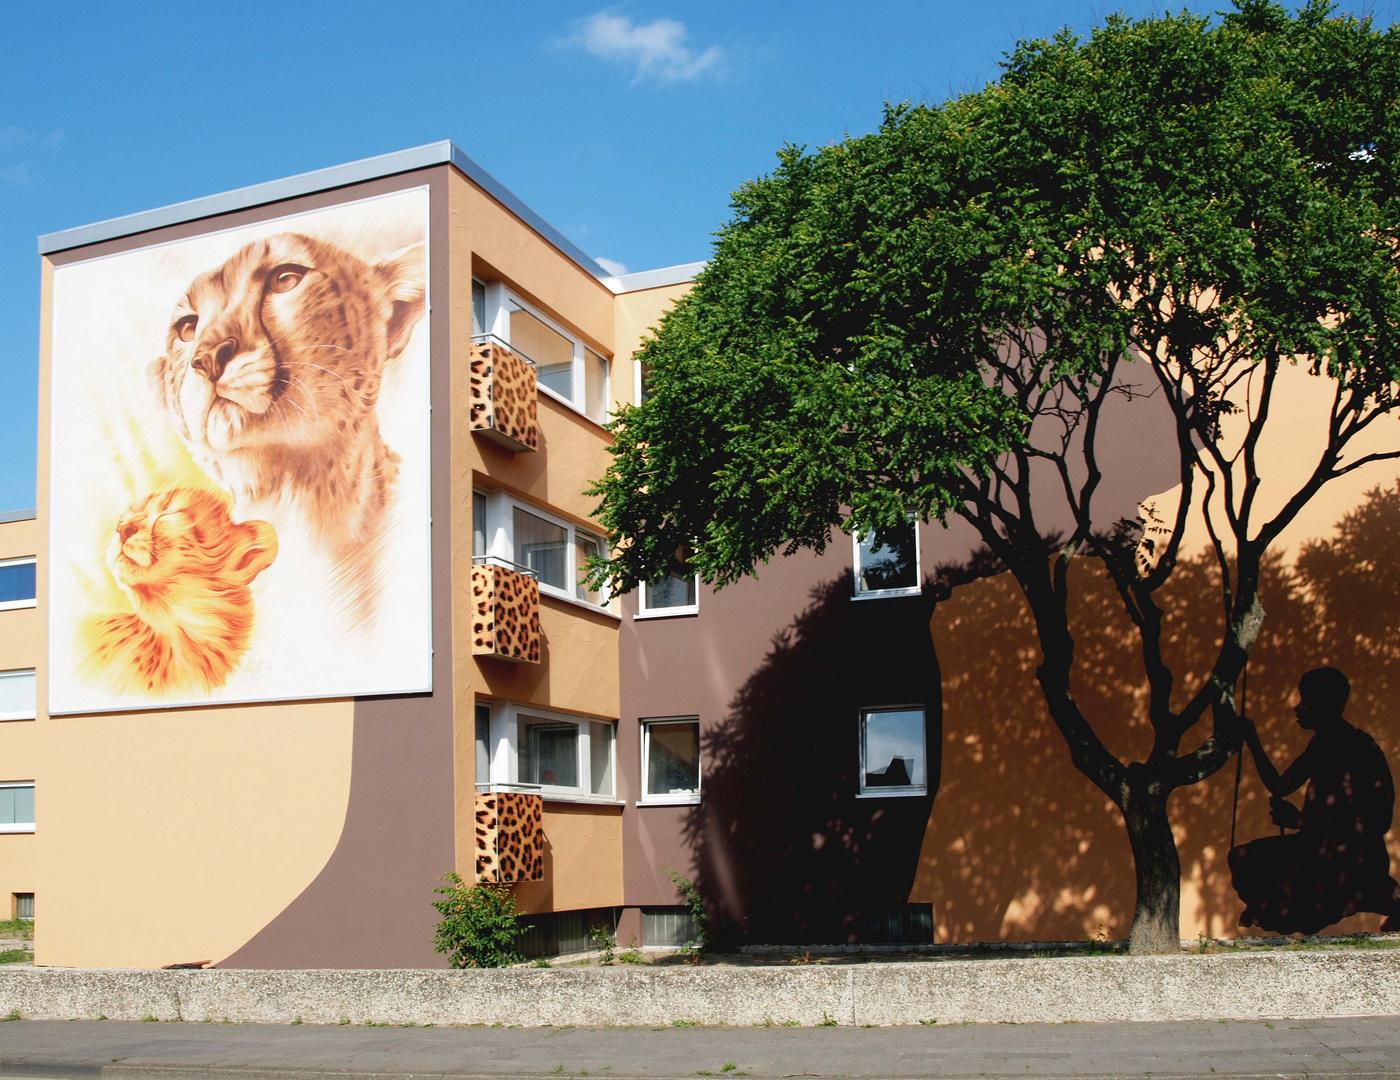 Das Gepardenhaus #3